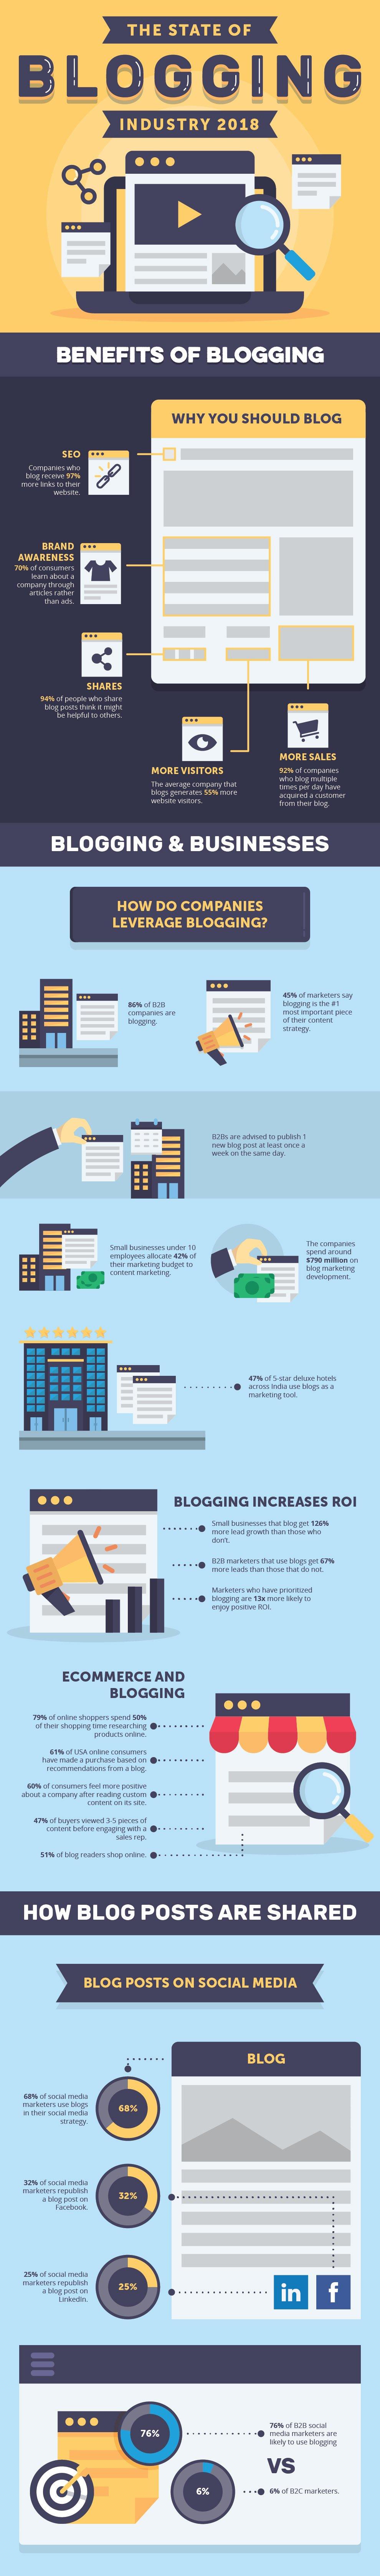 Infographic-blogging